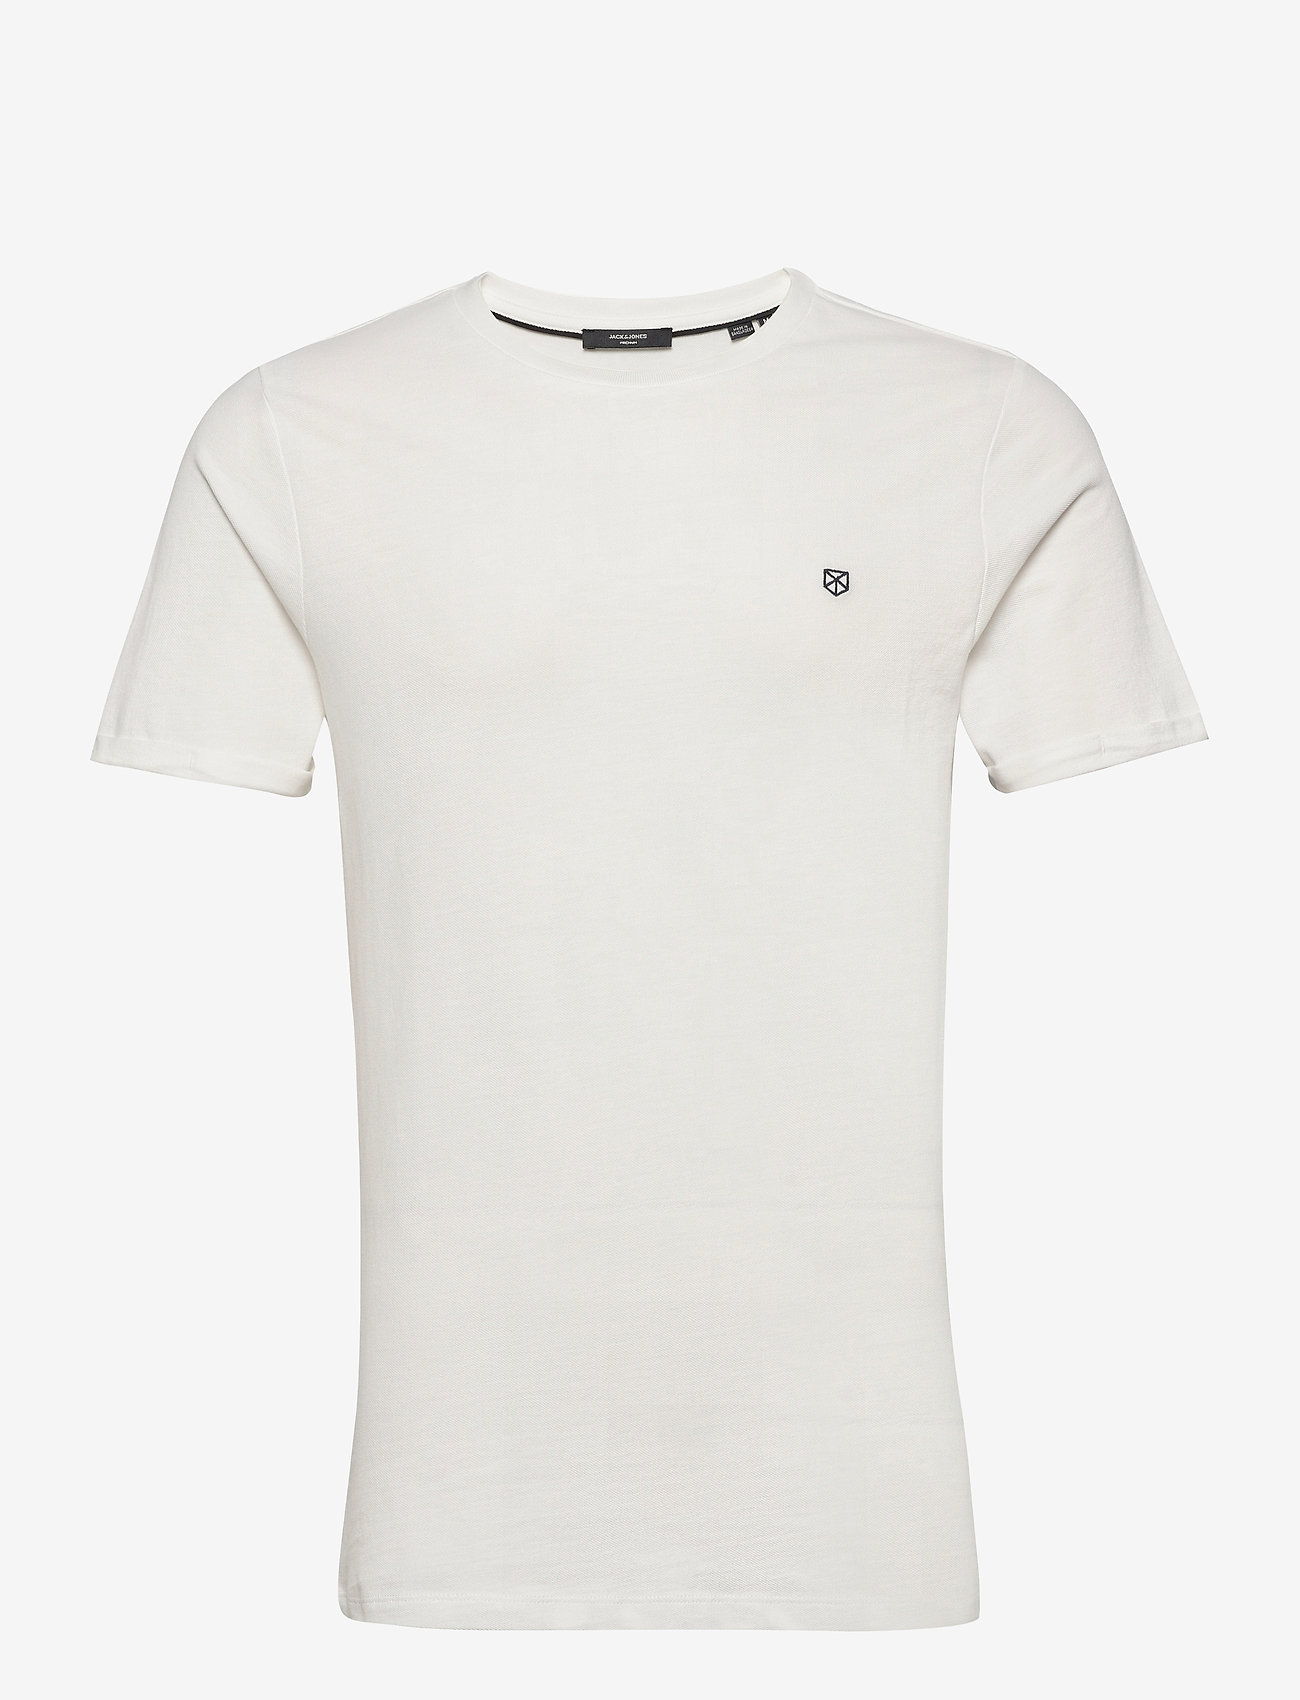 Jack & Jones - JPRBLAHARDY TEE SS CREW NECK STS - basic t-shirts - blanc de blanc - 0